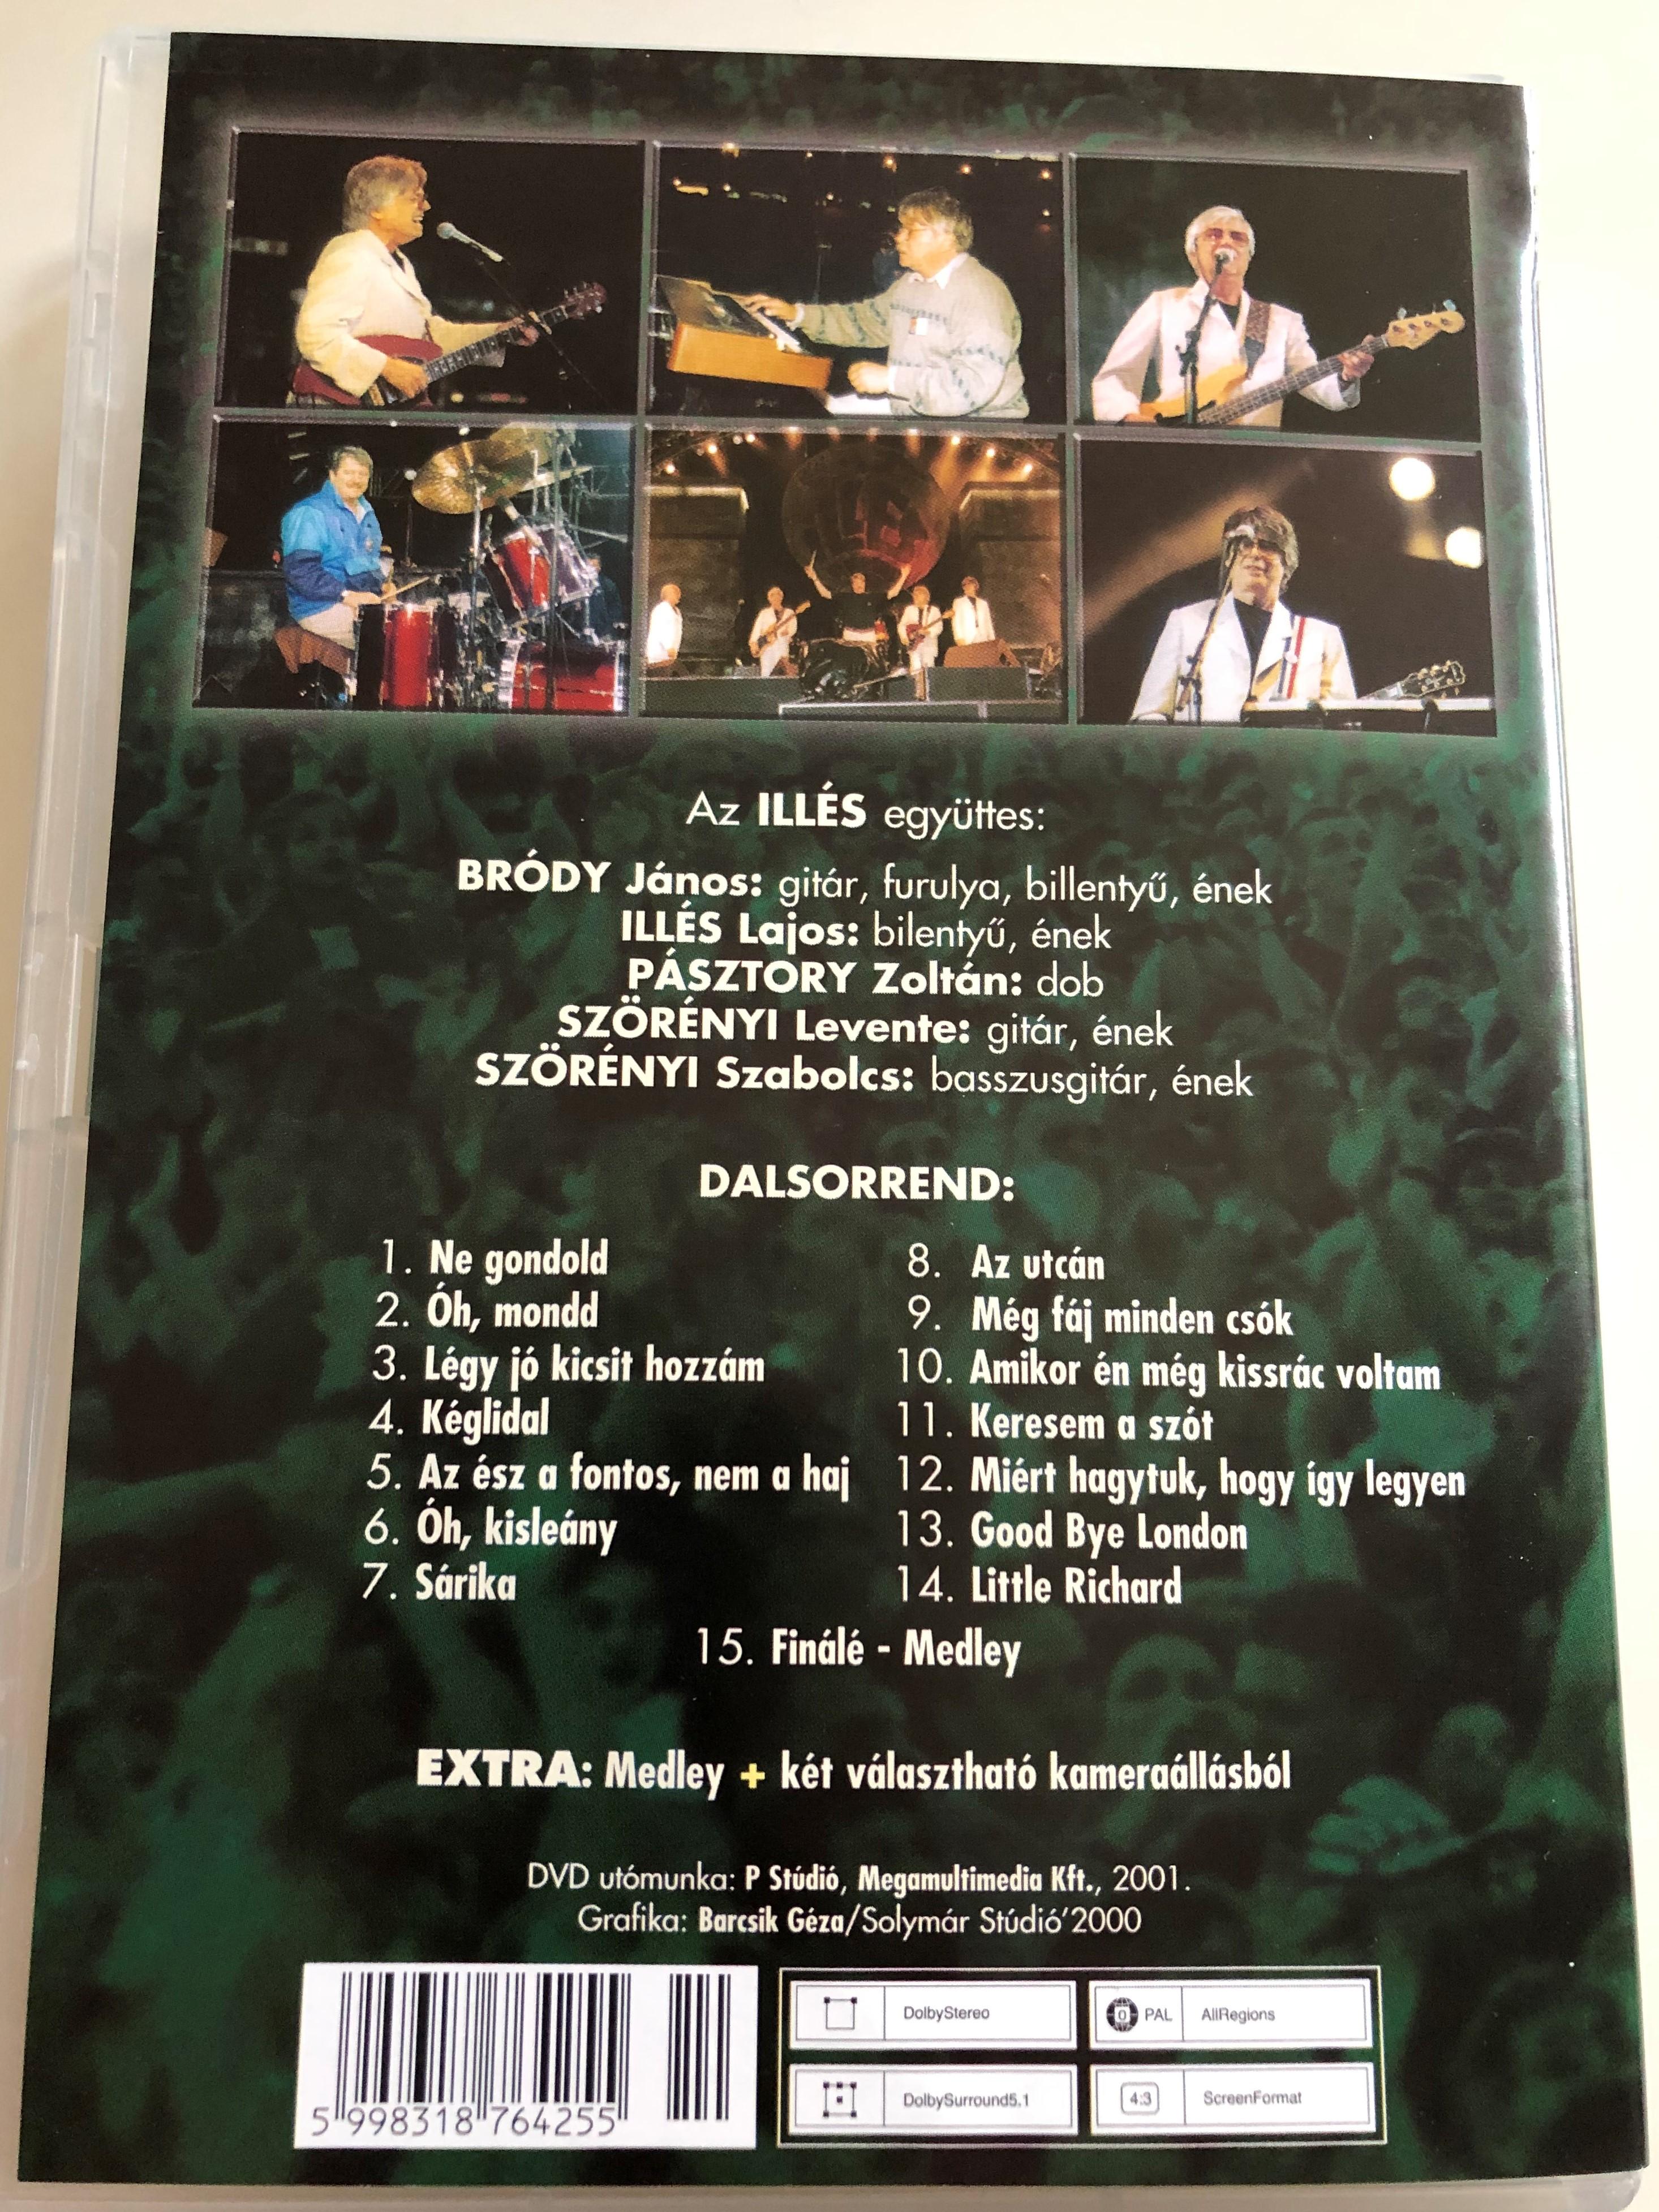 ill-s-szuperkoncert-dvd-2001-n-pstadion-2001-j-nius-2-3.jpg